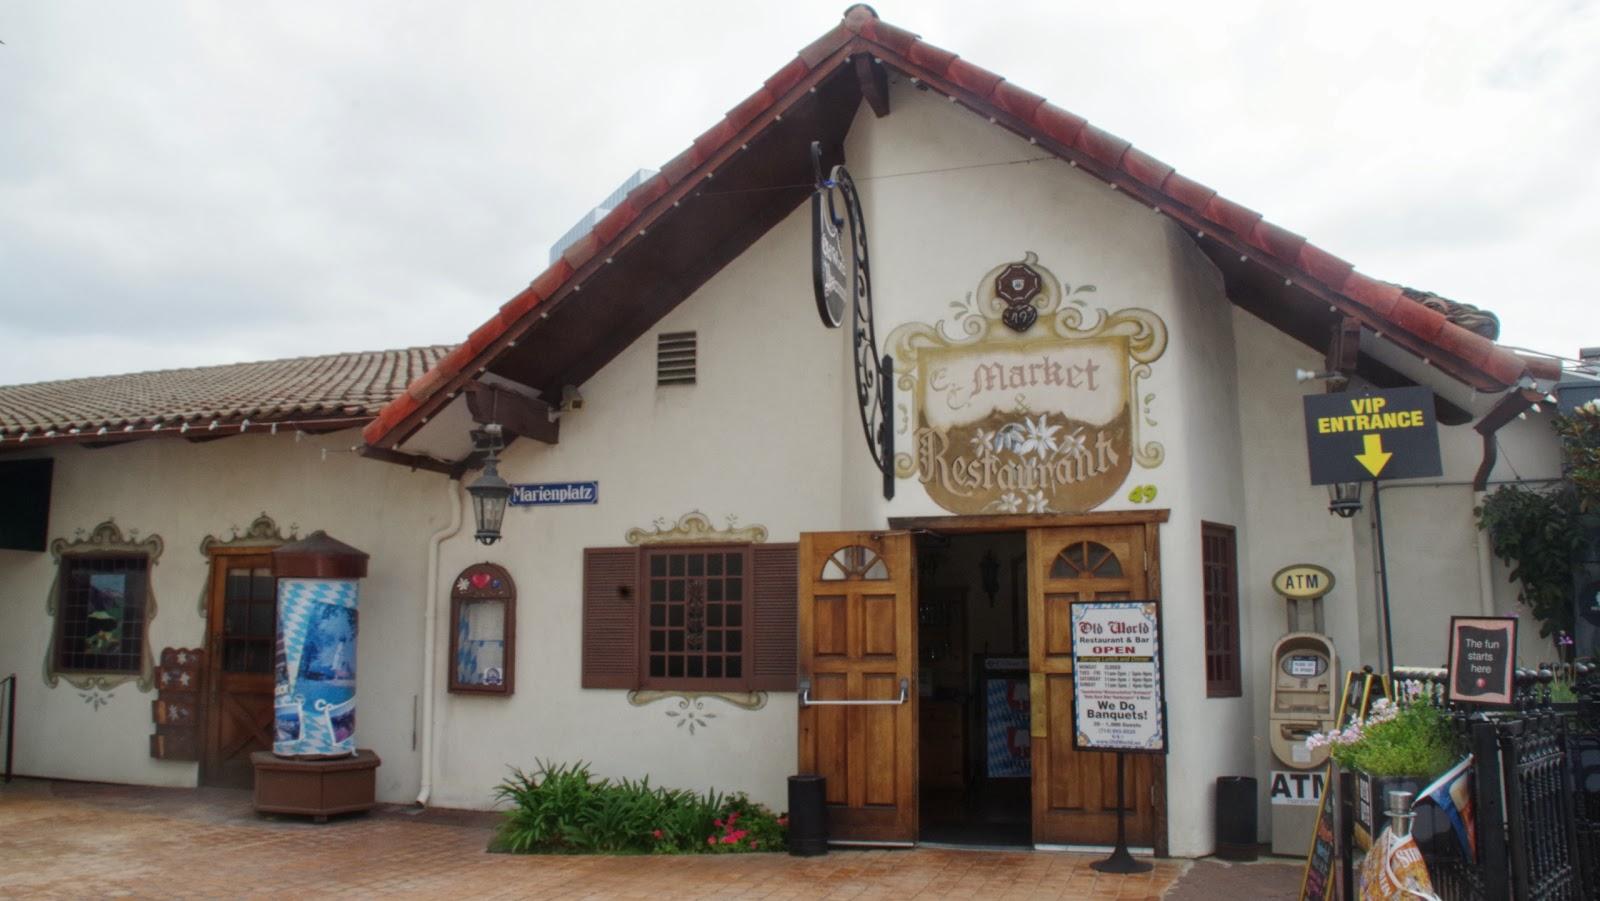 Oc The Old World Village In Huntington Beach